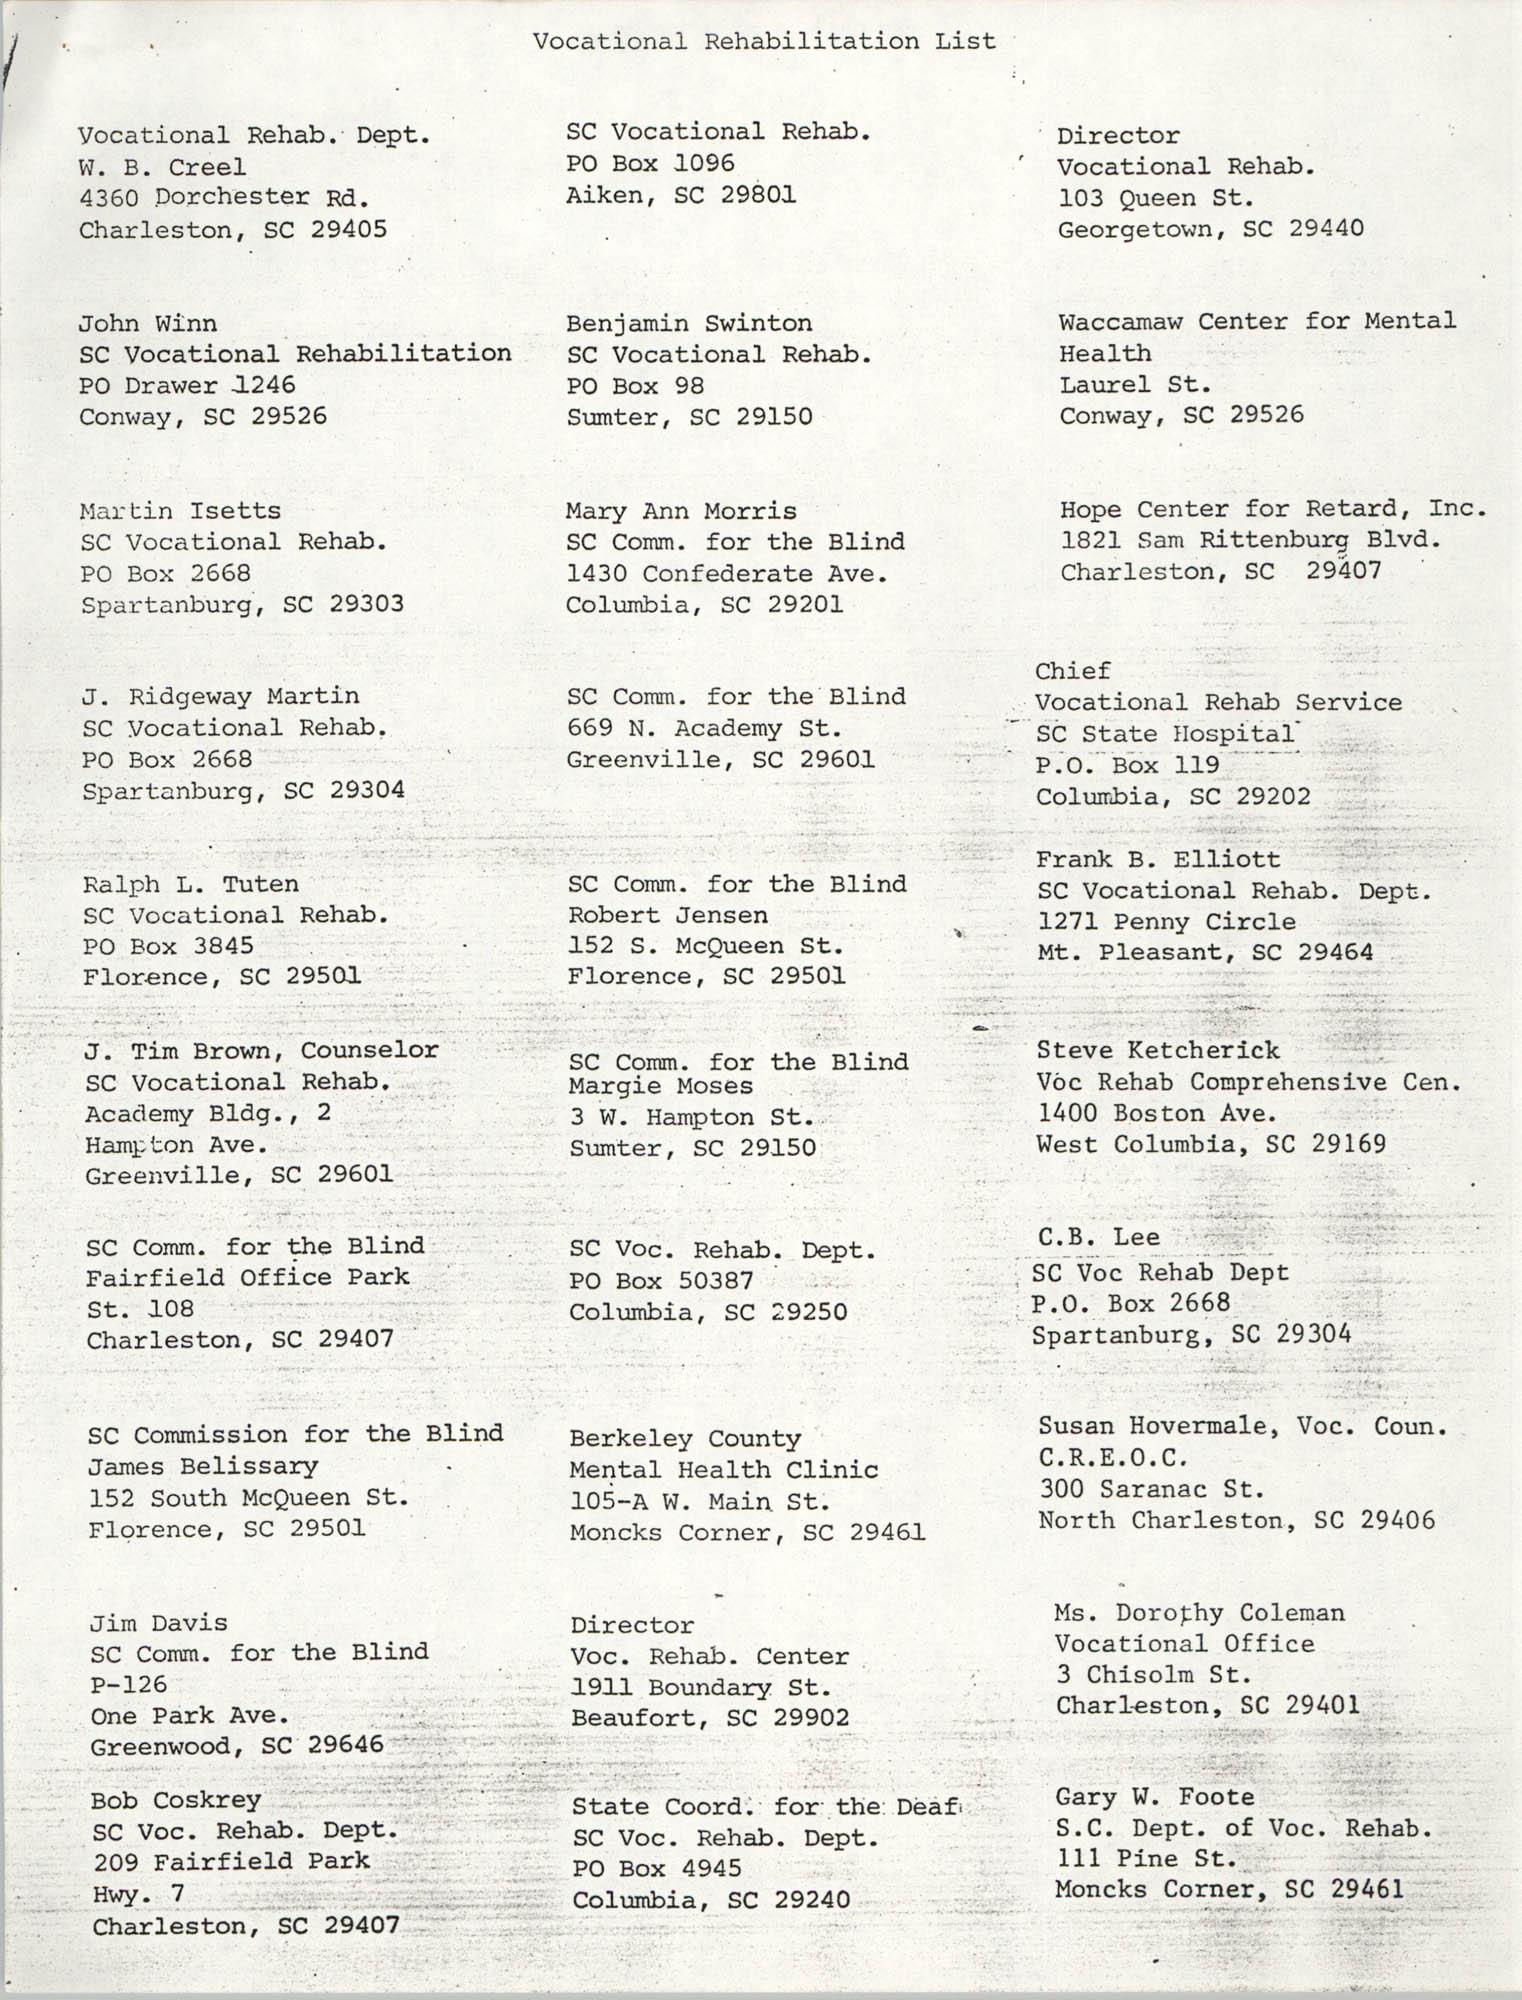 Vocational Rehabilitation List